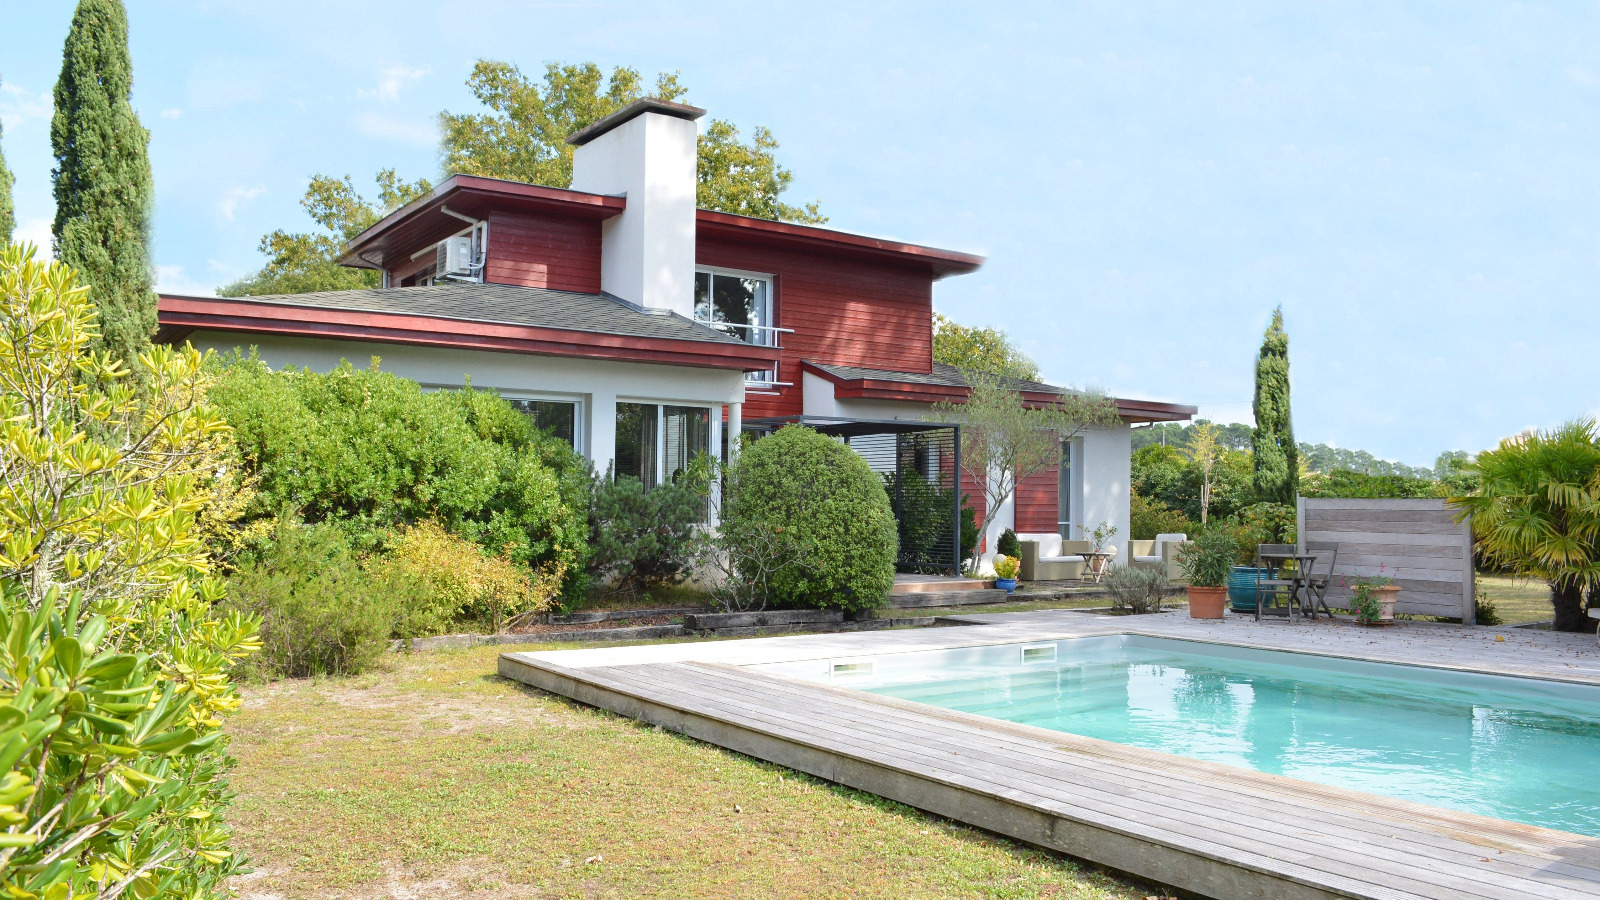 Andernos les bains villa d 39 architecte proche commerces for Piscine andernos